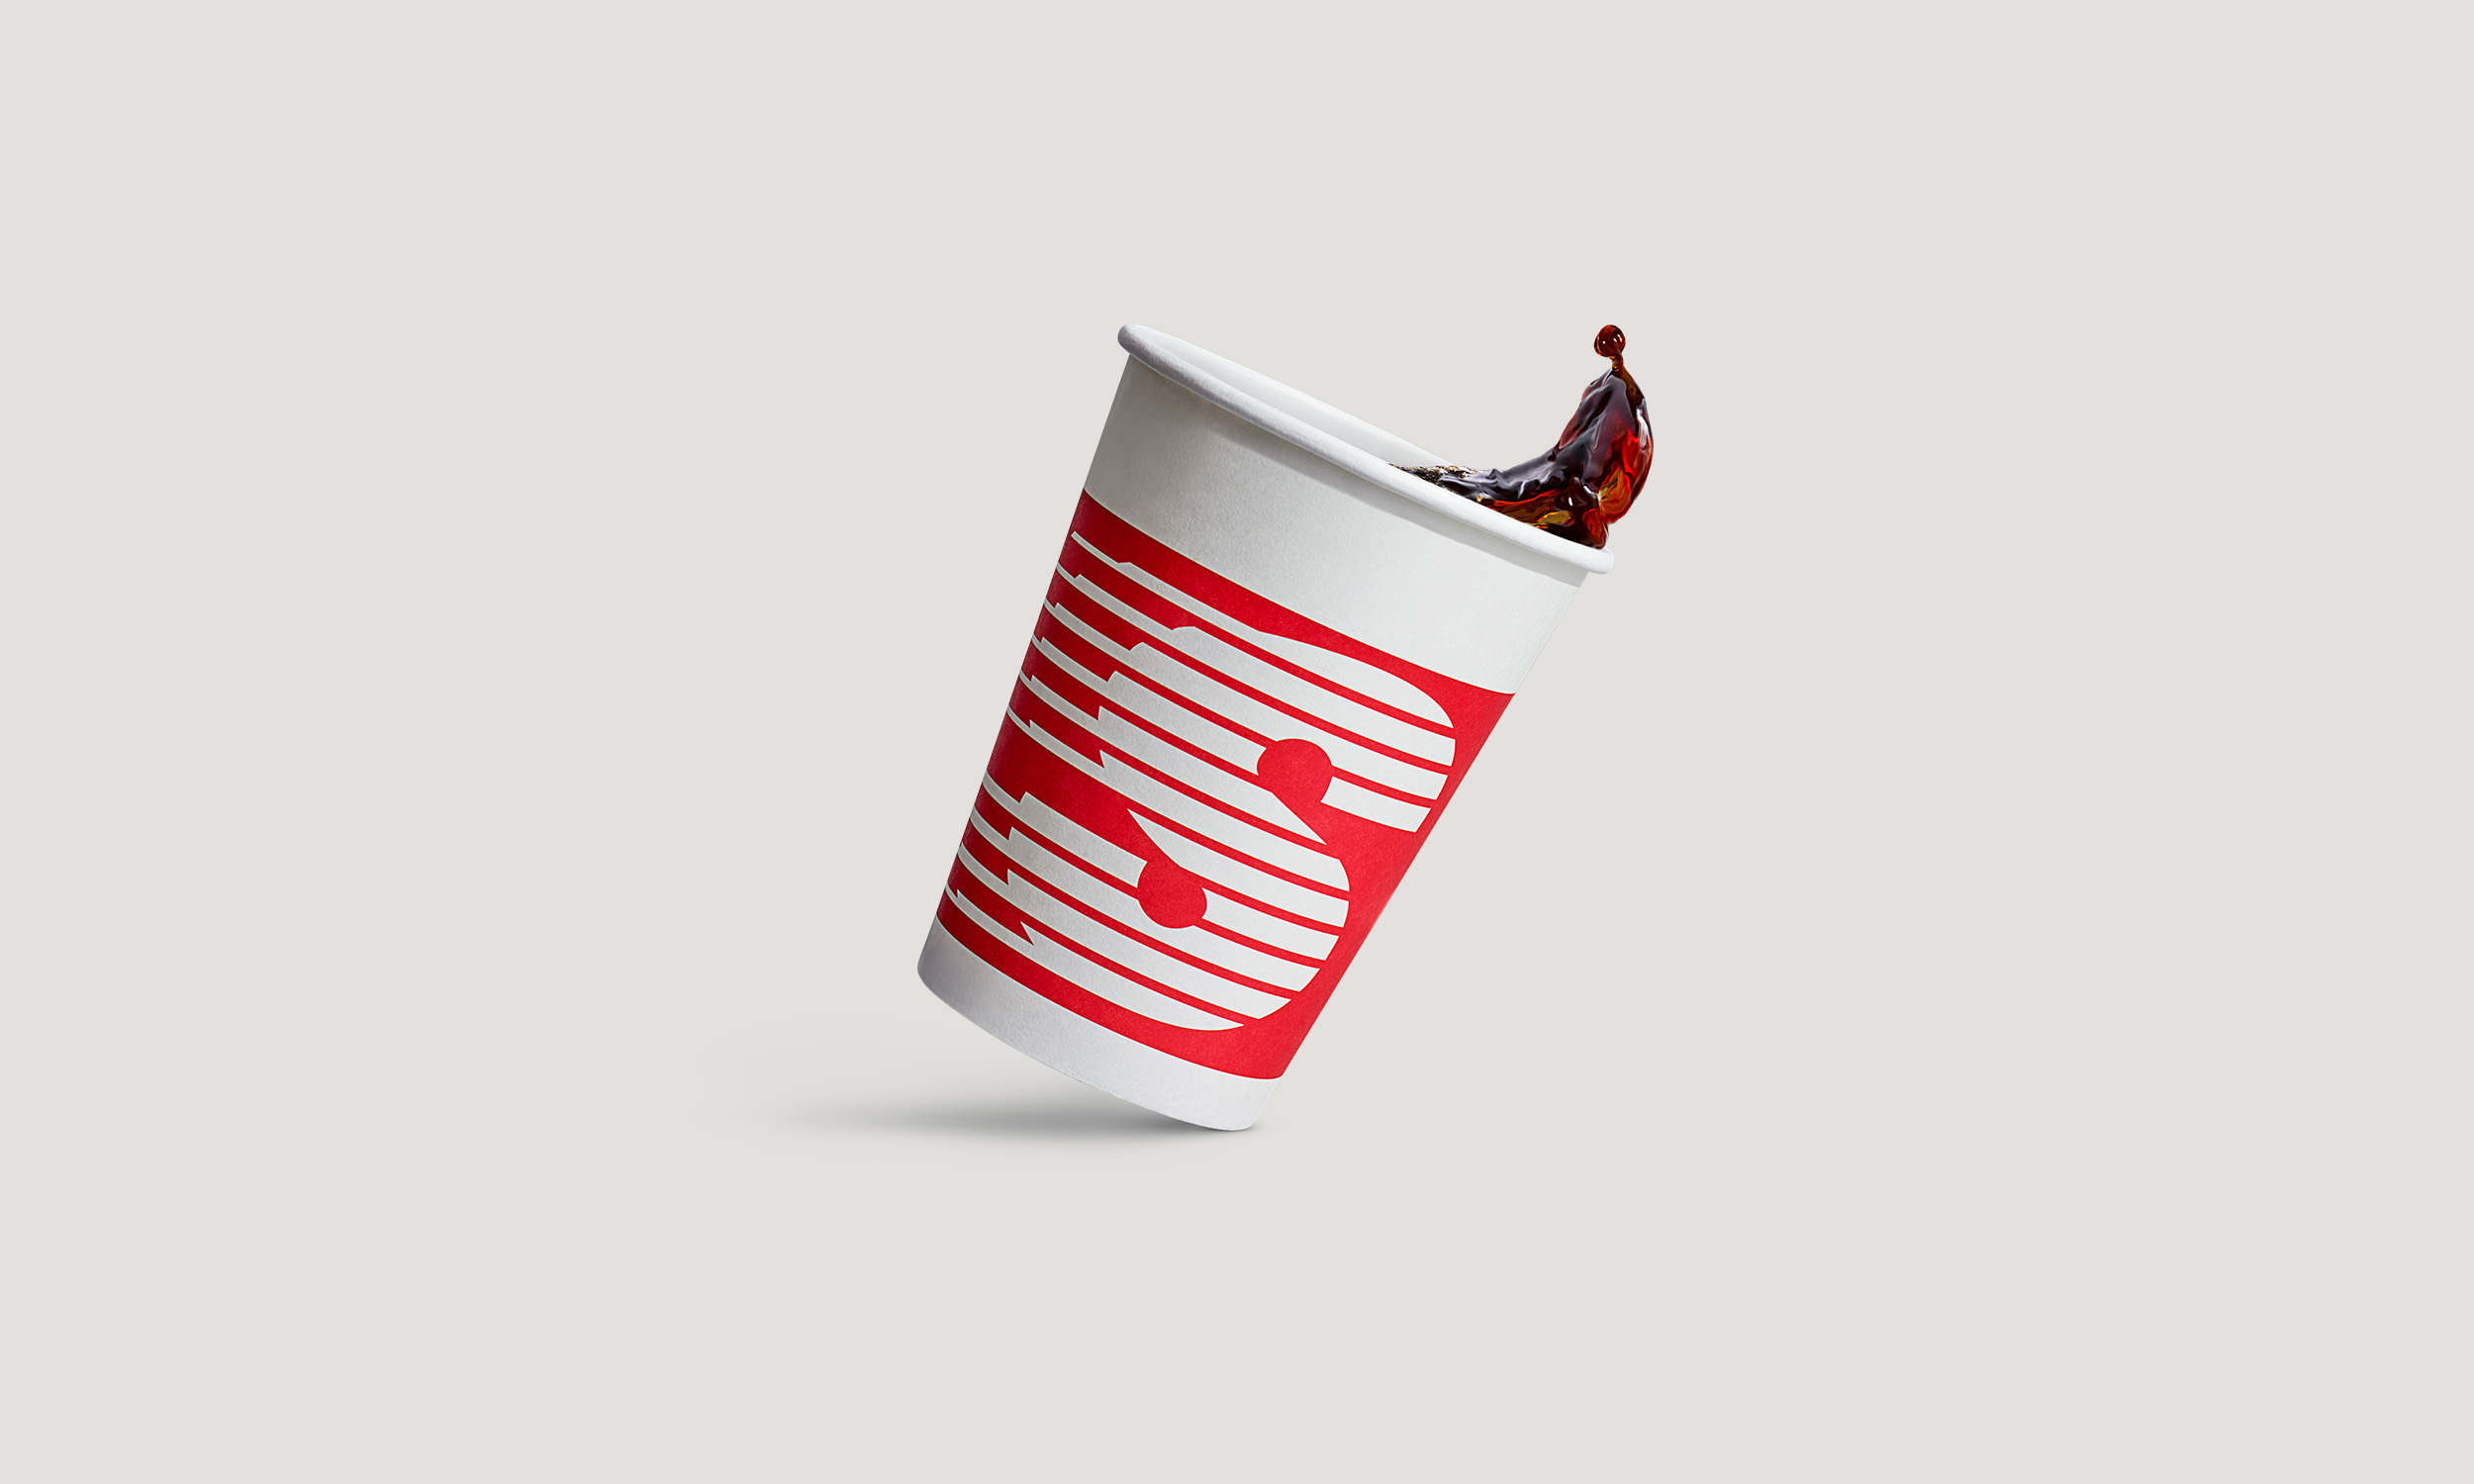 Speedway_IsometricProductPhotography_Coffee-Espresso Splash.jpg